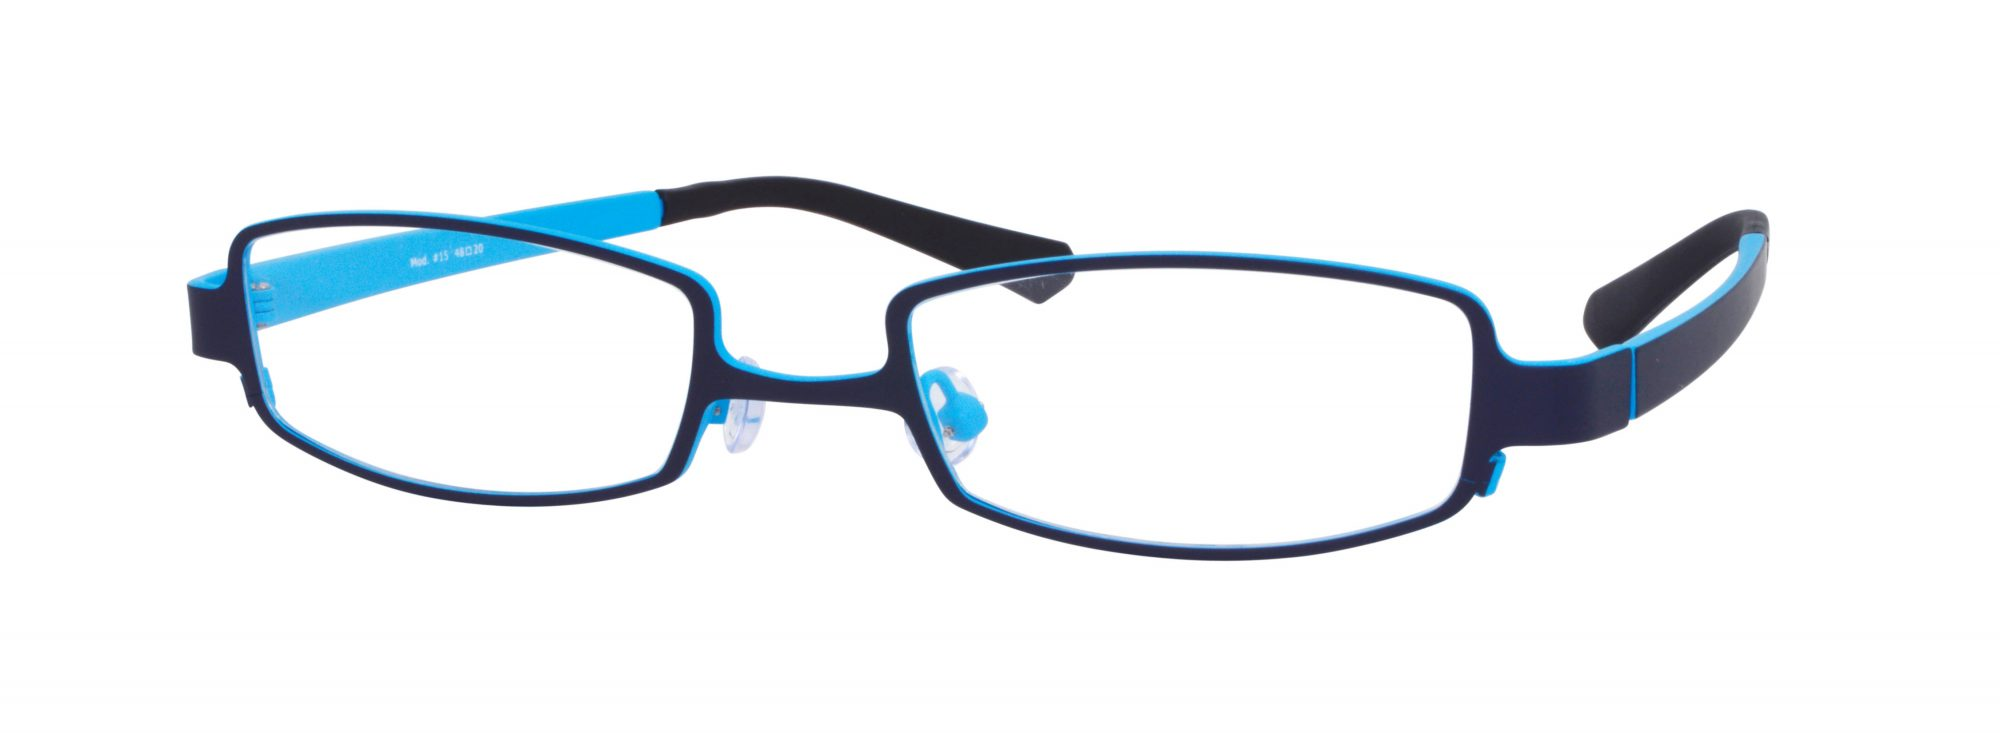 Erin's World frame style number EW-15 in blue and navy matt